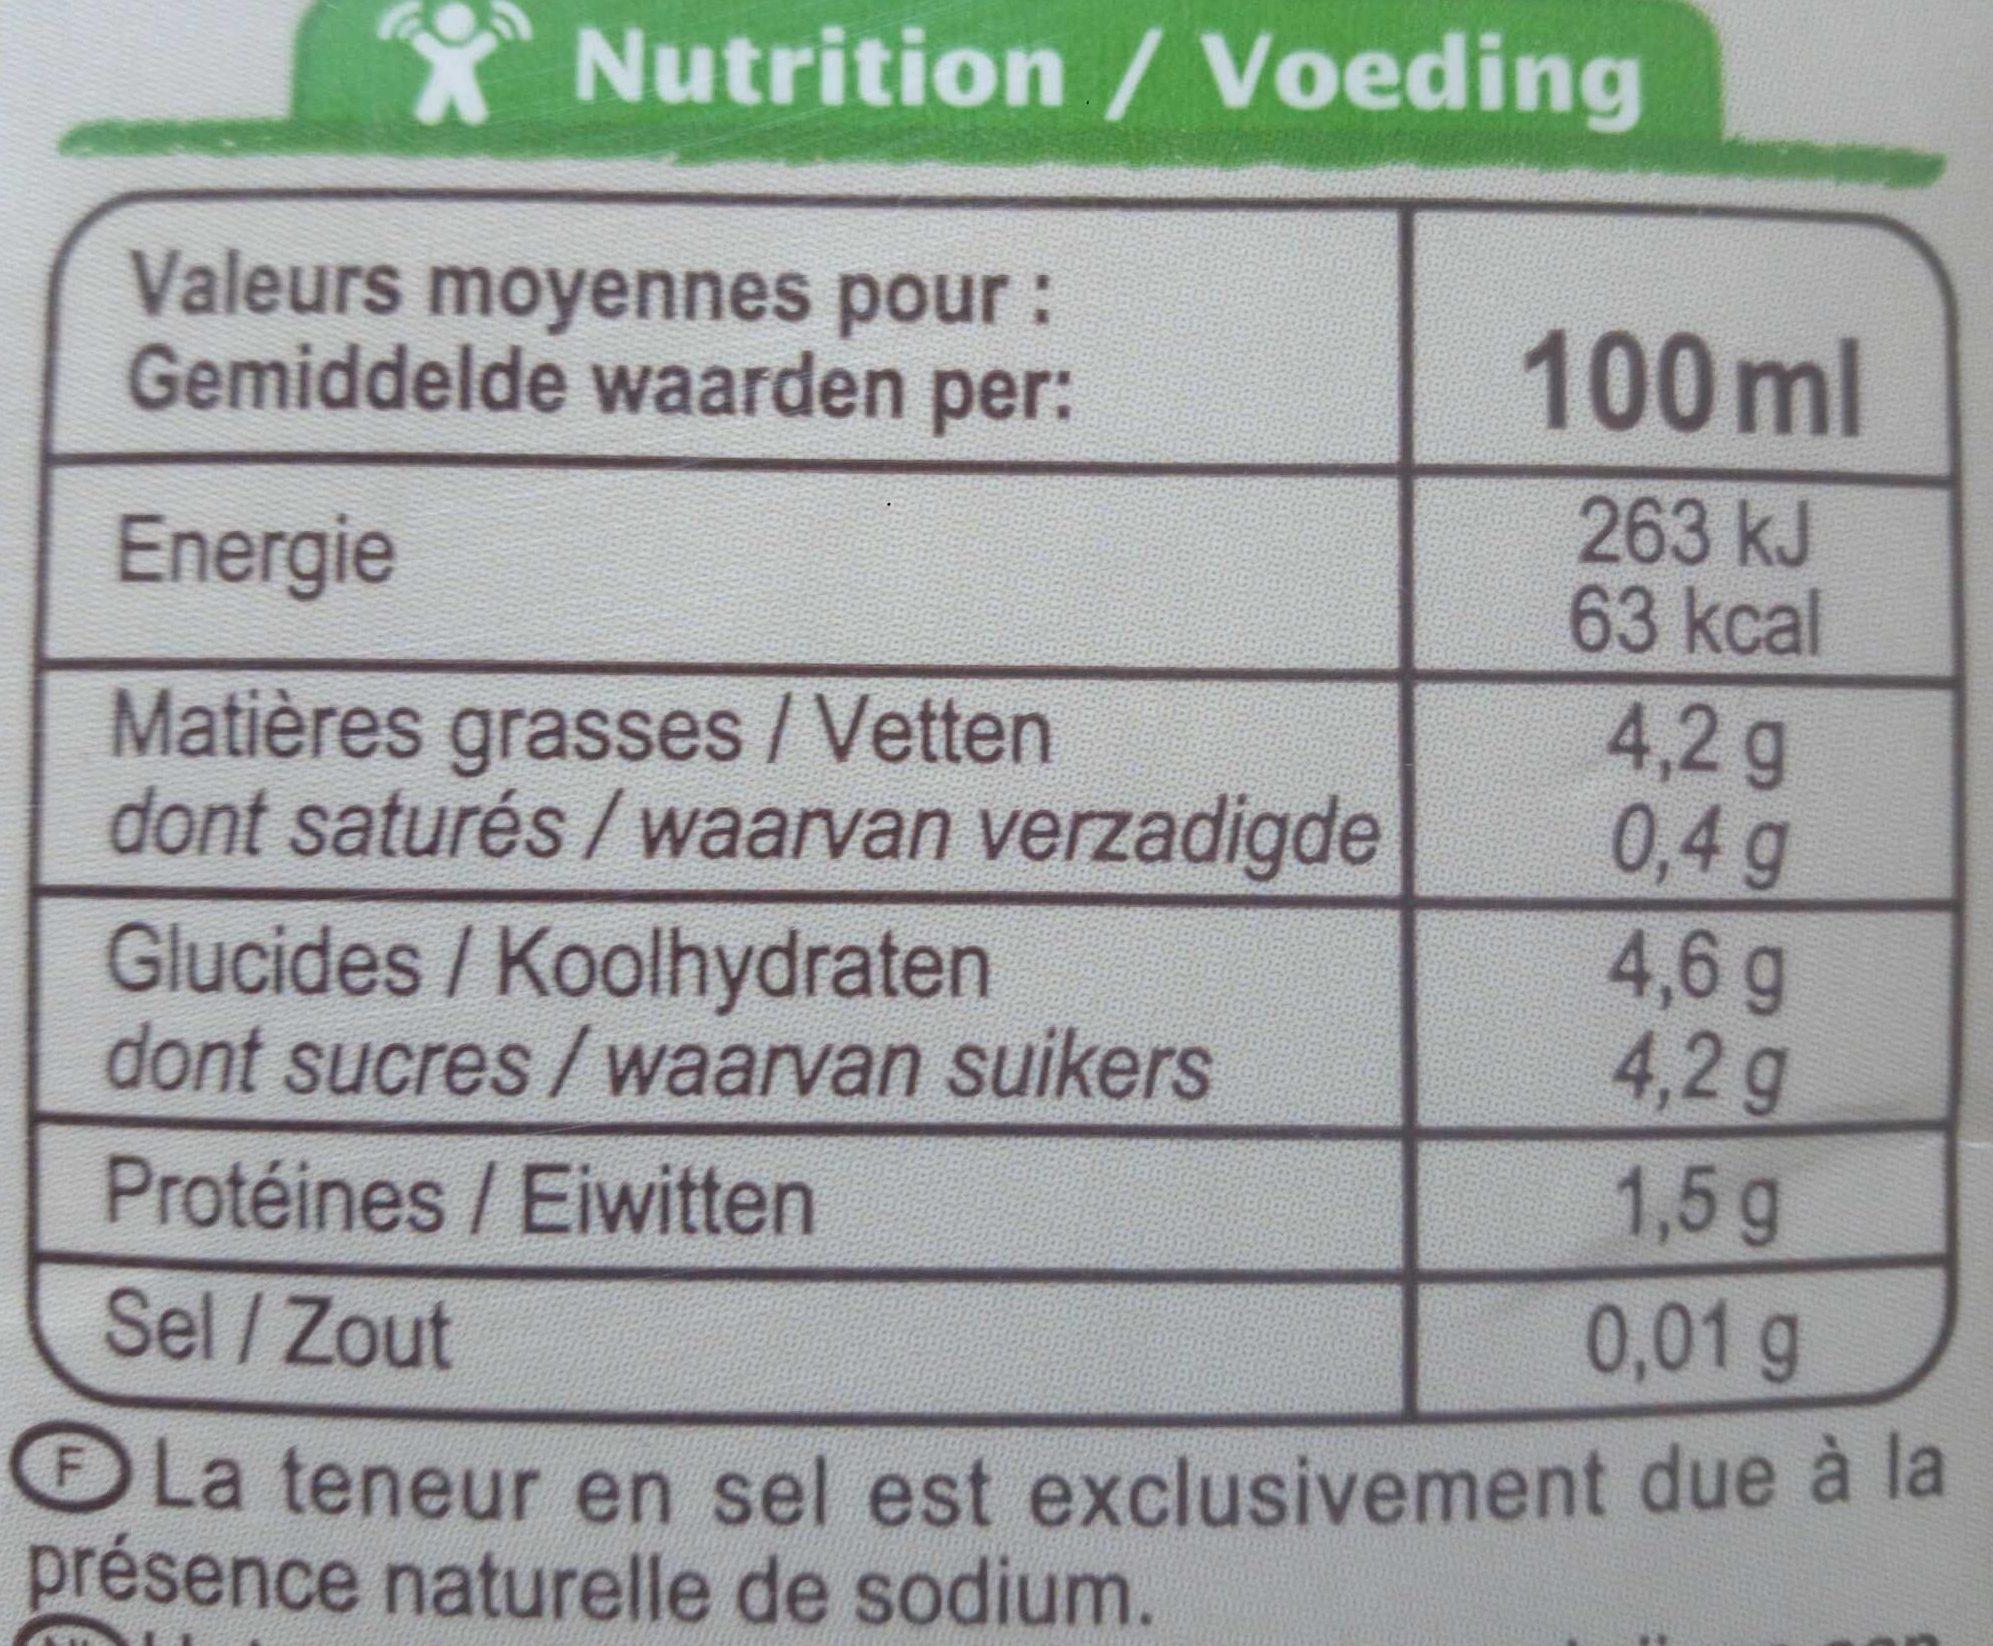 Boisson amande intense - Información nutricional